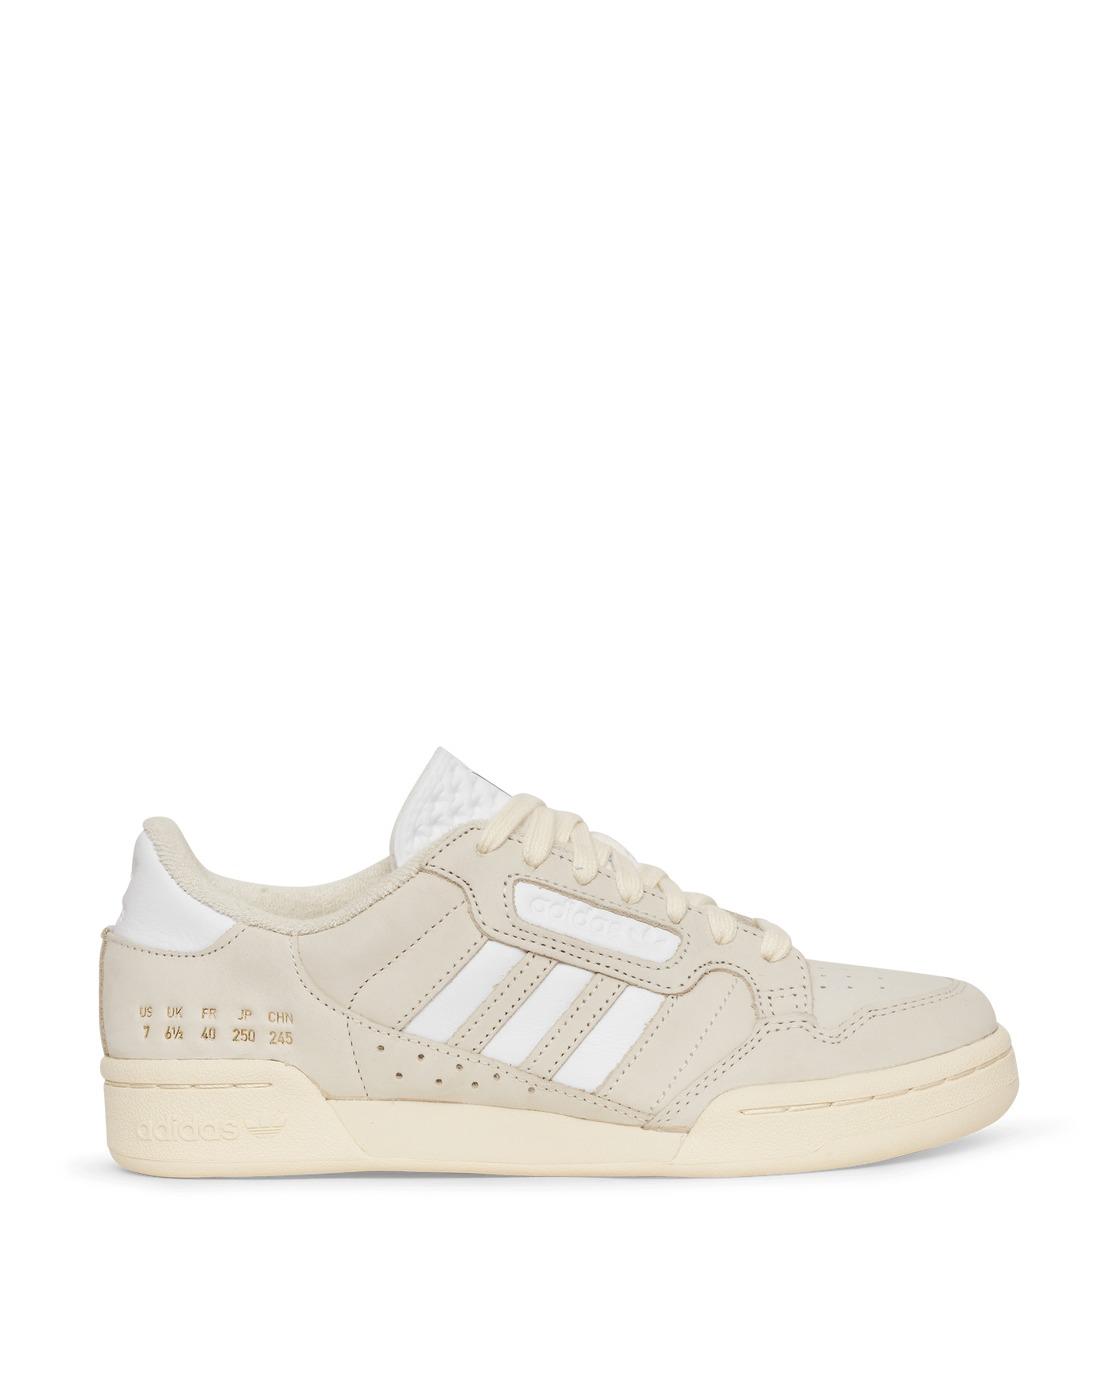 Photo: Adidas Originals Continental 80 Stripes Sneakers Cream White